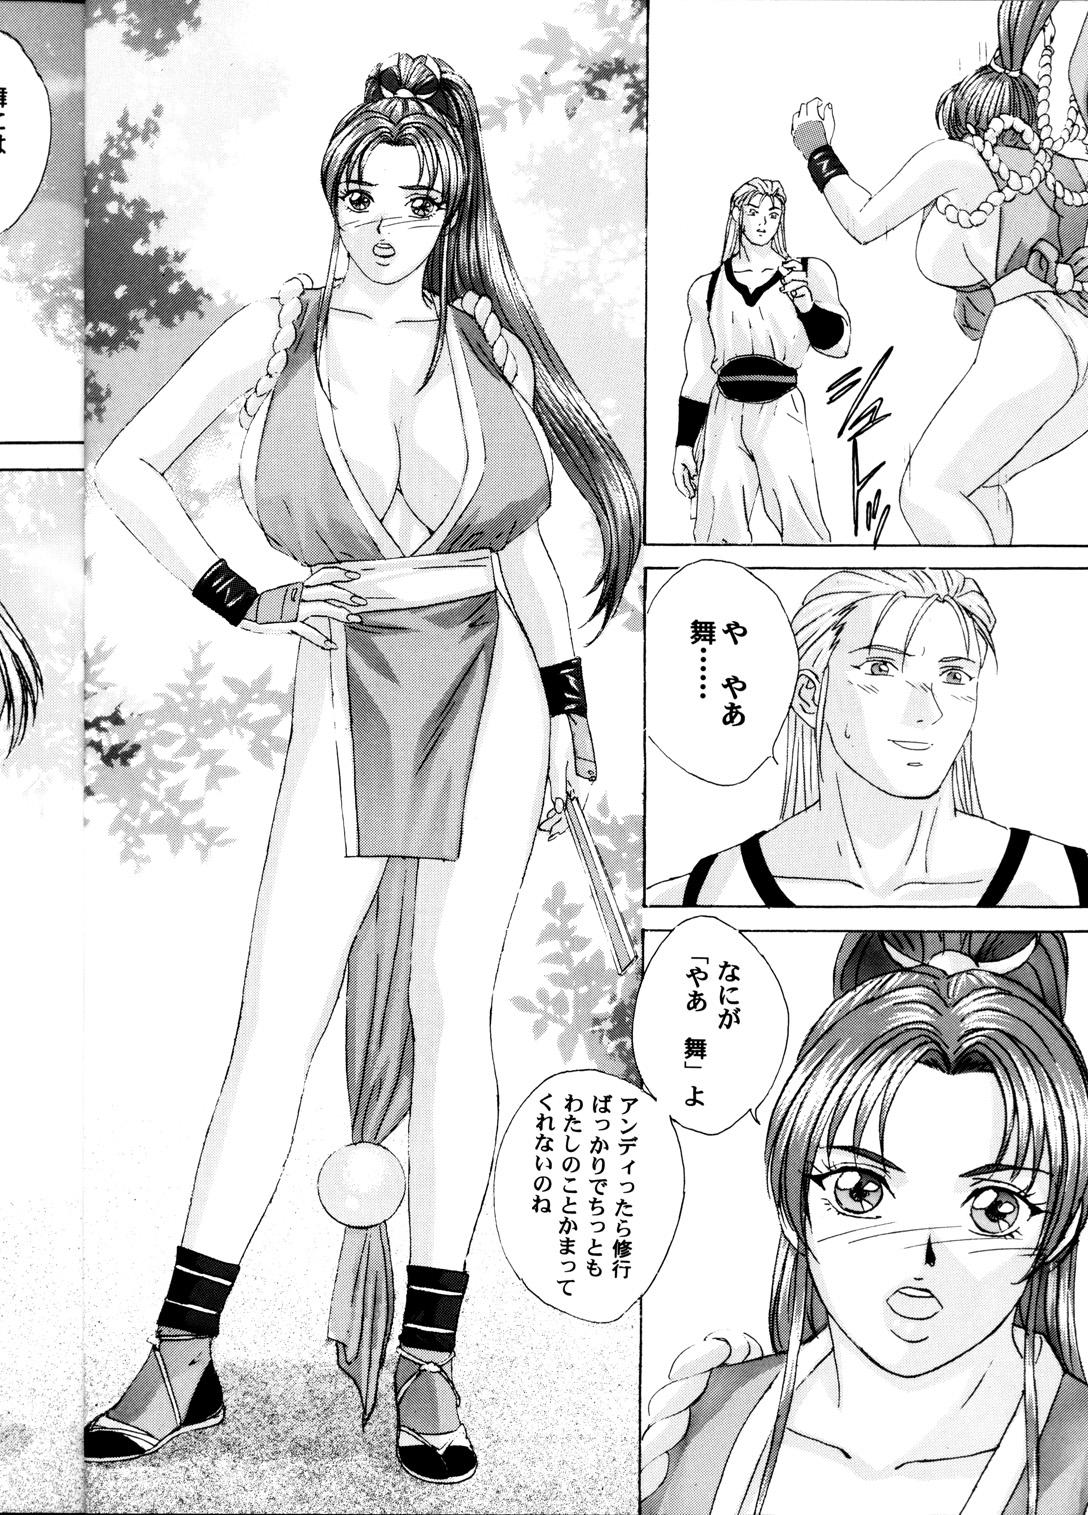 (C60) [D-LOVERS (Nishimaki Tohru)] Mai -Innyuuden- Daiichigou (King of Fighters) 4